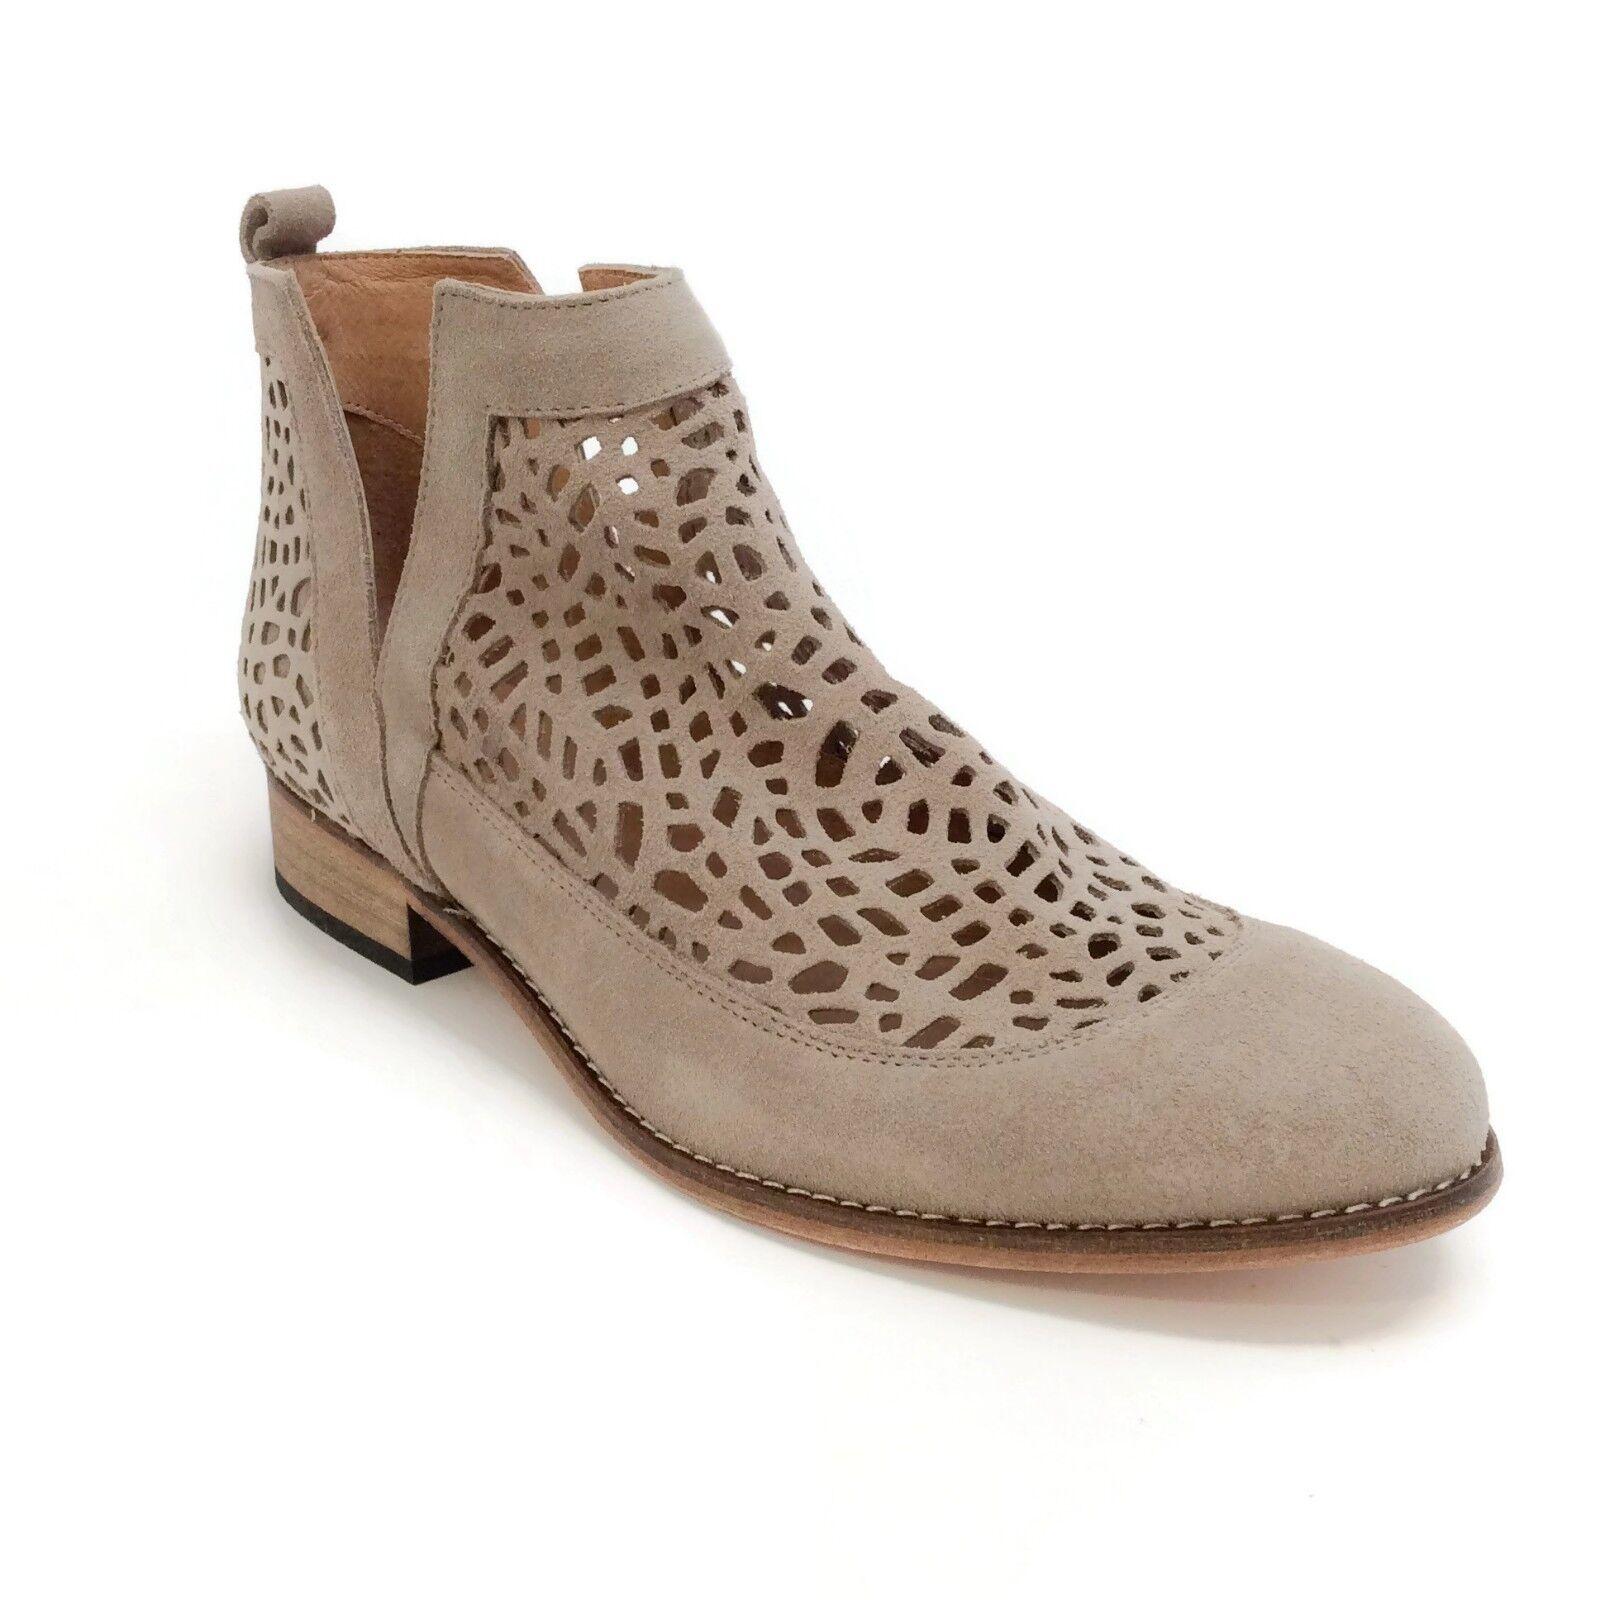 qualità di prima classe Howsty Nekal Nekal Nekal Perforated Ankle stivali Mink RETAIL  328  disegni esclusivi